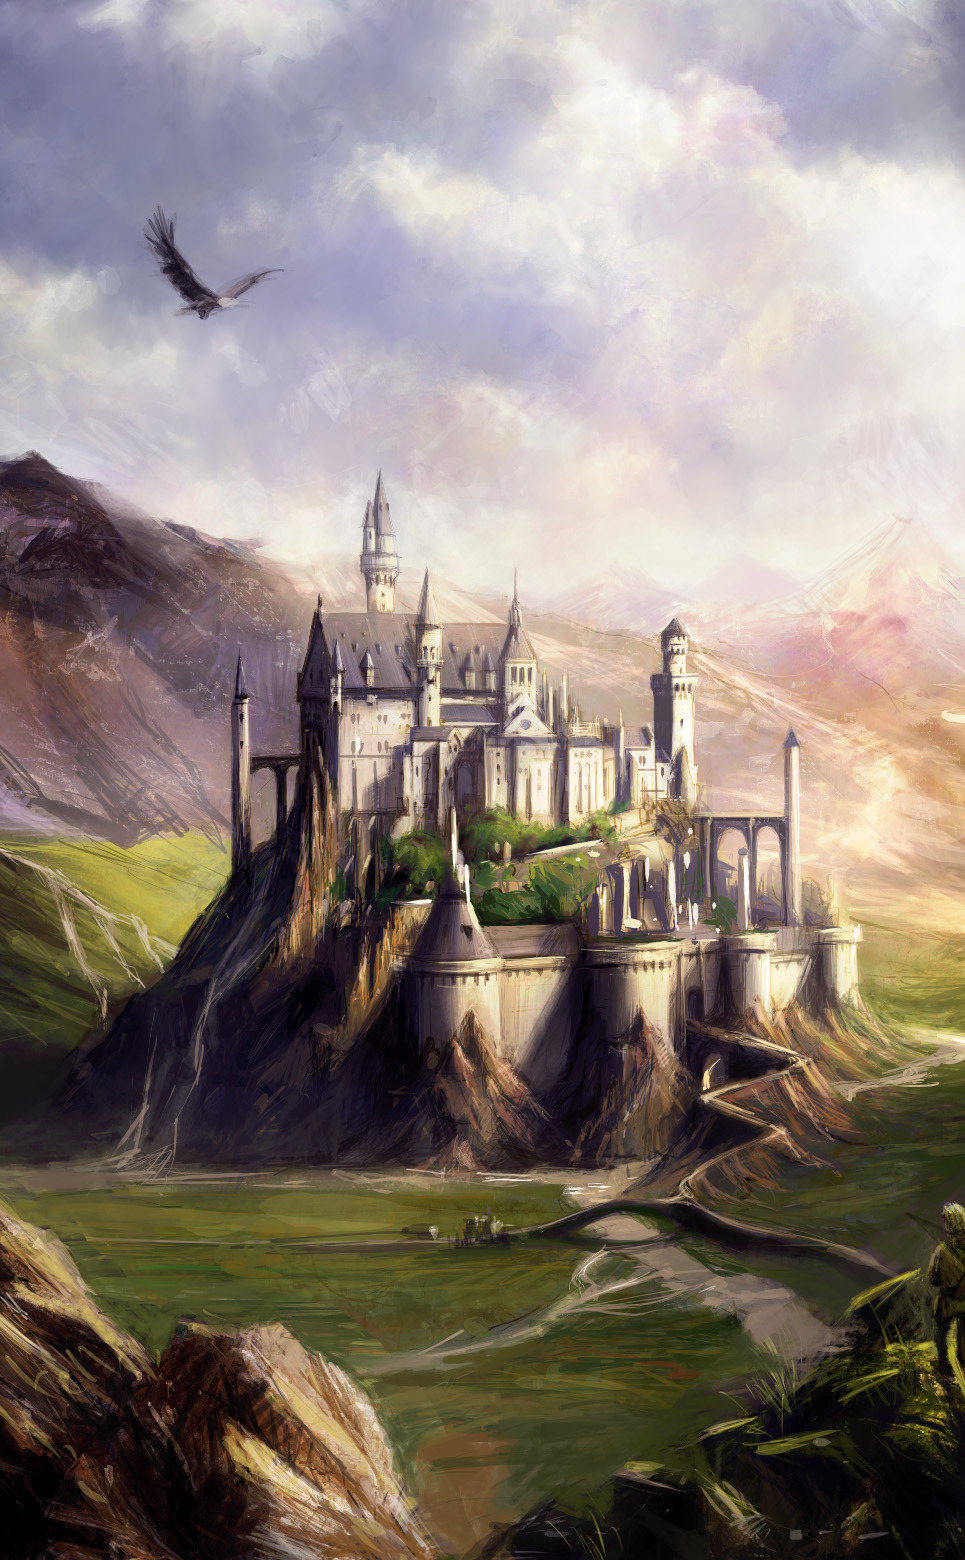 Gondolin show